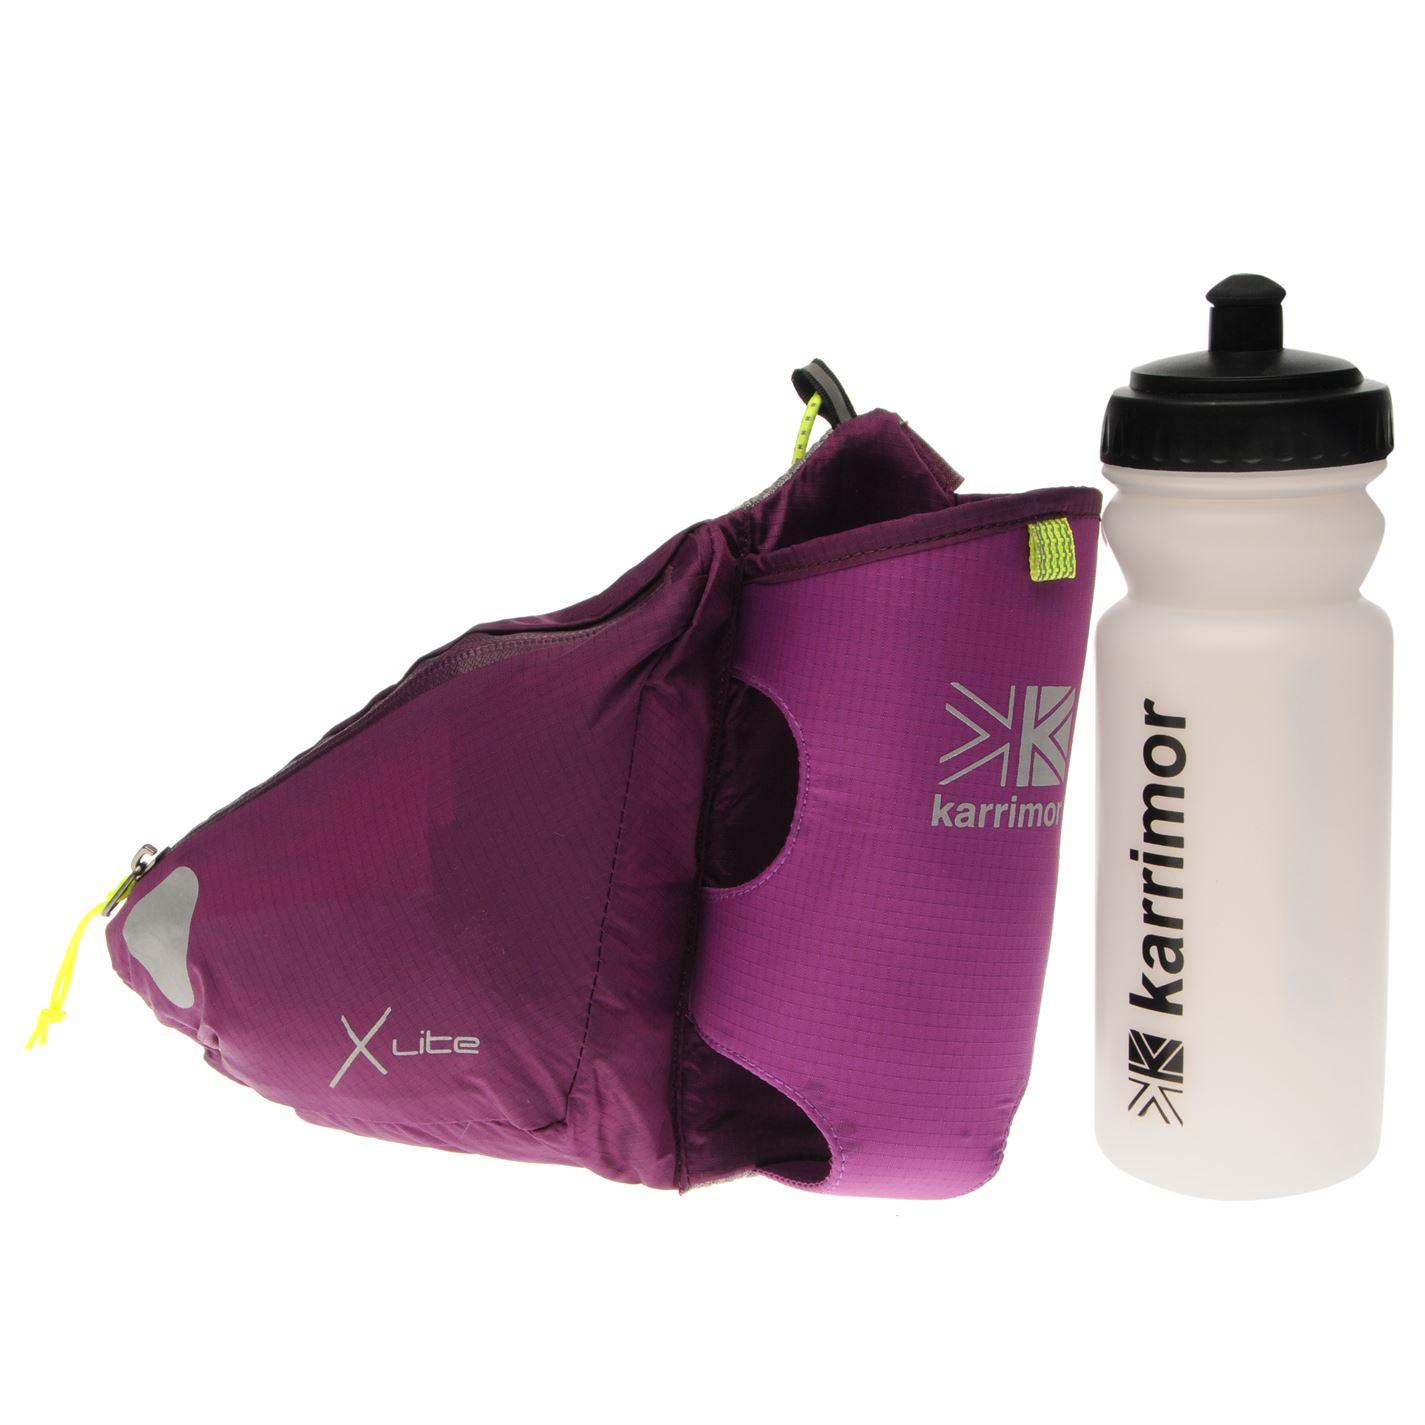 Karrimor X Lite Jogging Belt Bottle Visibility Stretchy Training Accessory